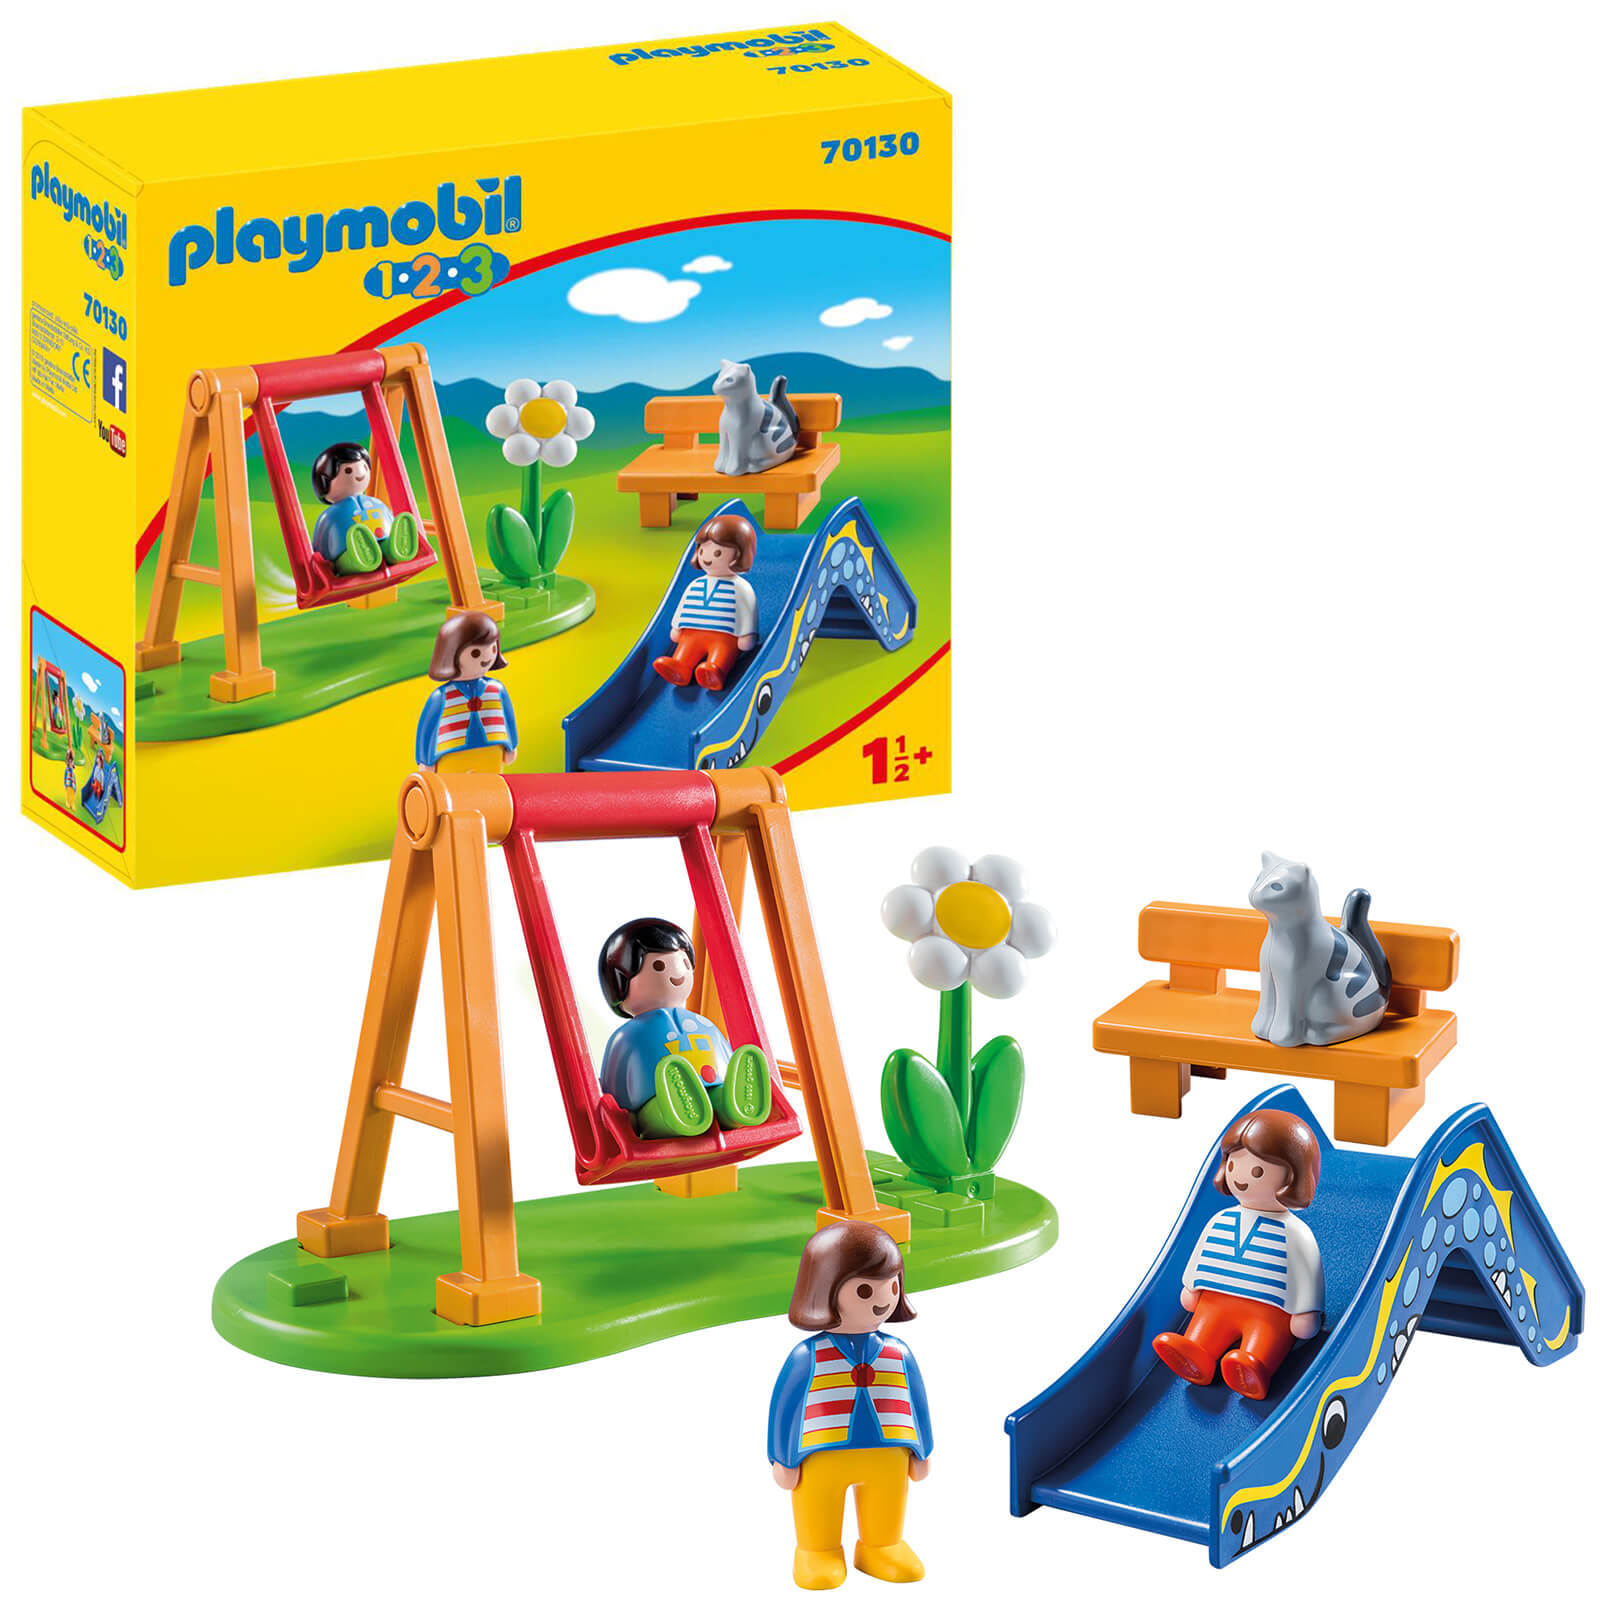 Playmobil 1.2.3 Childrens Playground For Children 18 Months+ (70130)